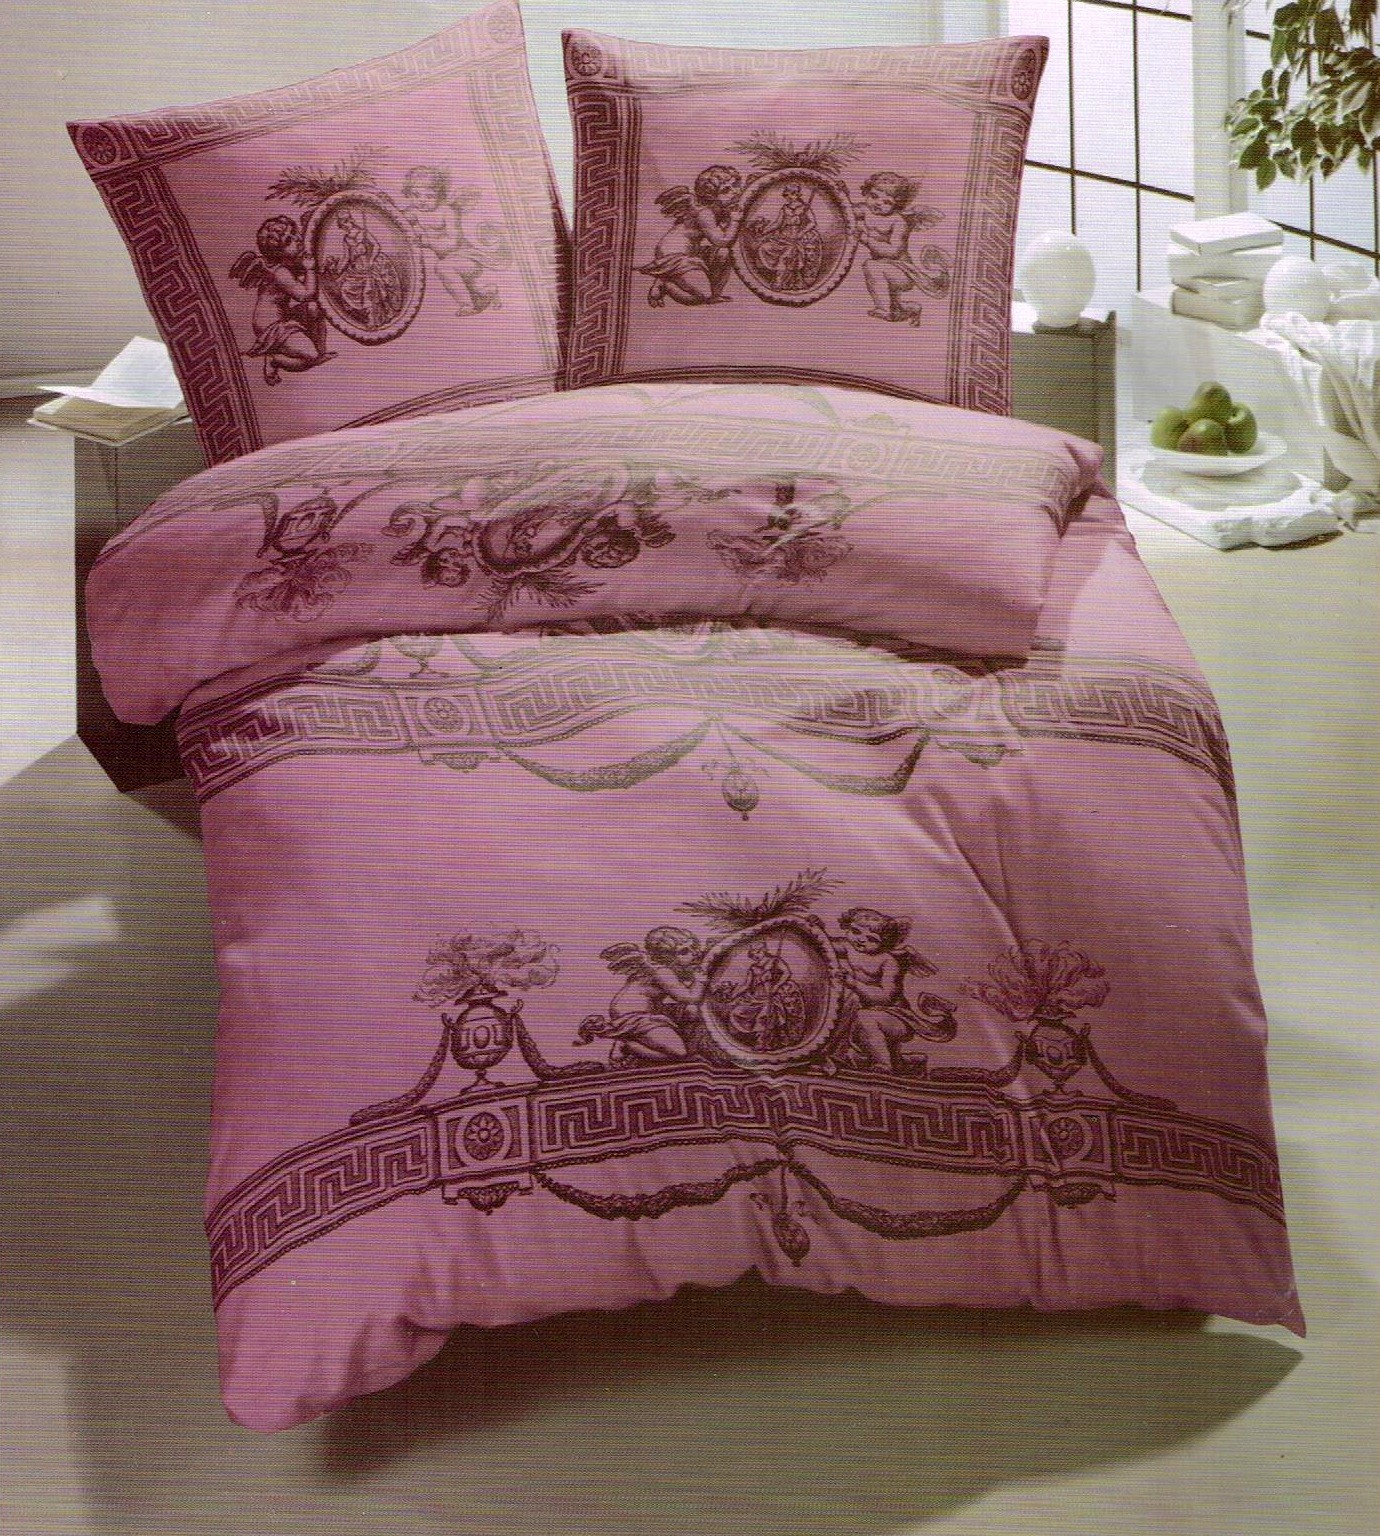 hochwertige bettw sche 2 tlg set 2 x kissenbezug purpur. Black Bedroom Furniture Sets. Home Design Ideas